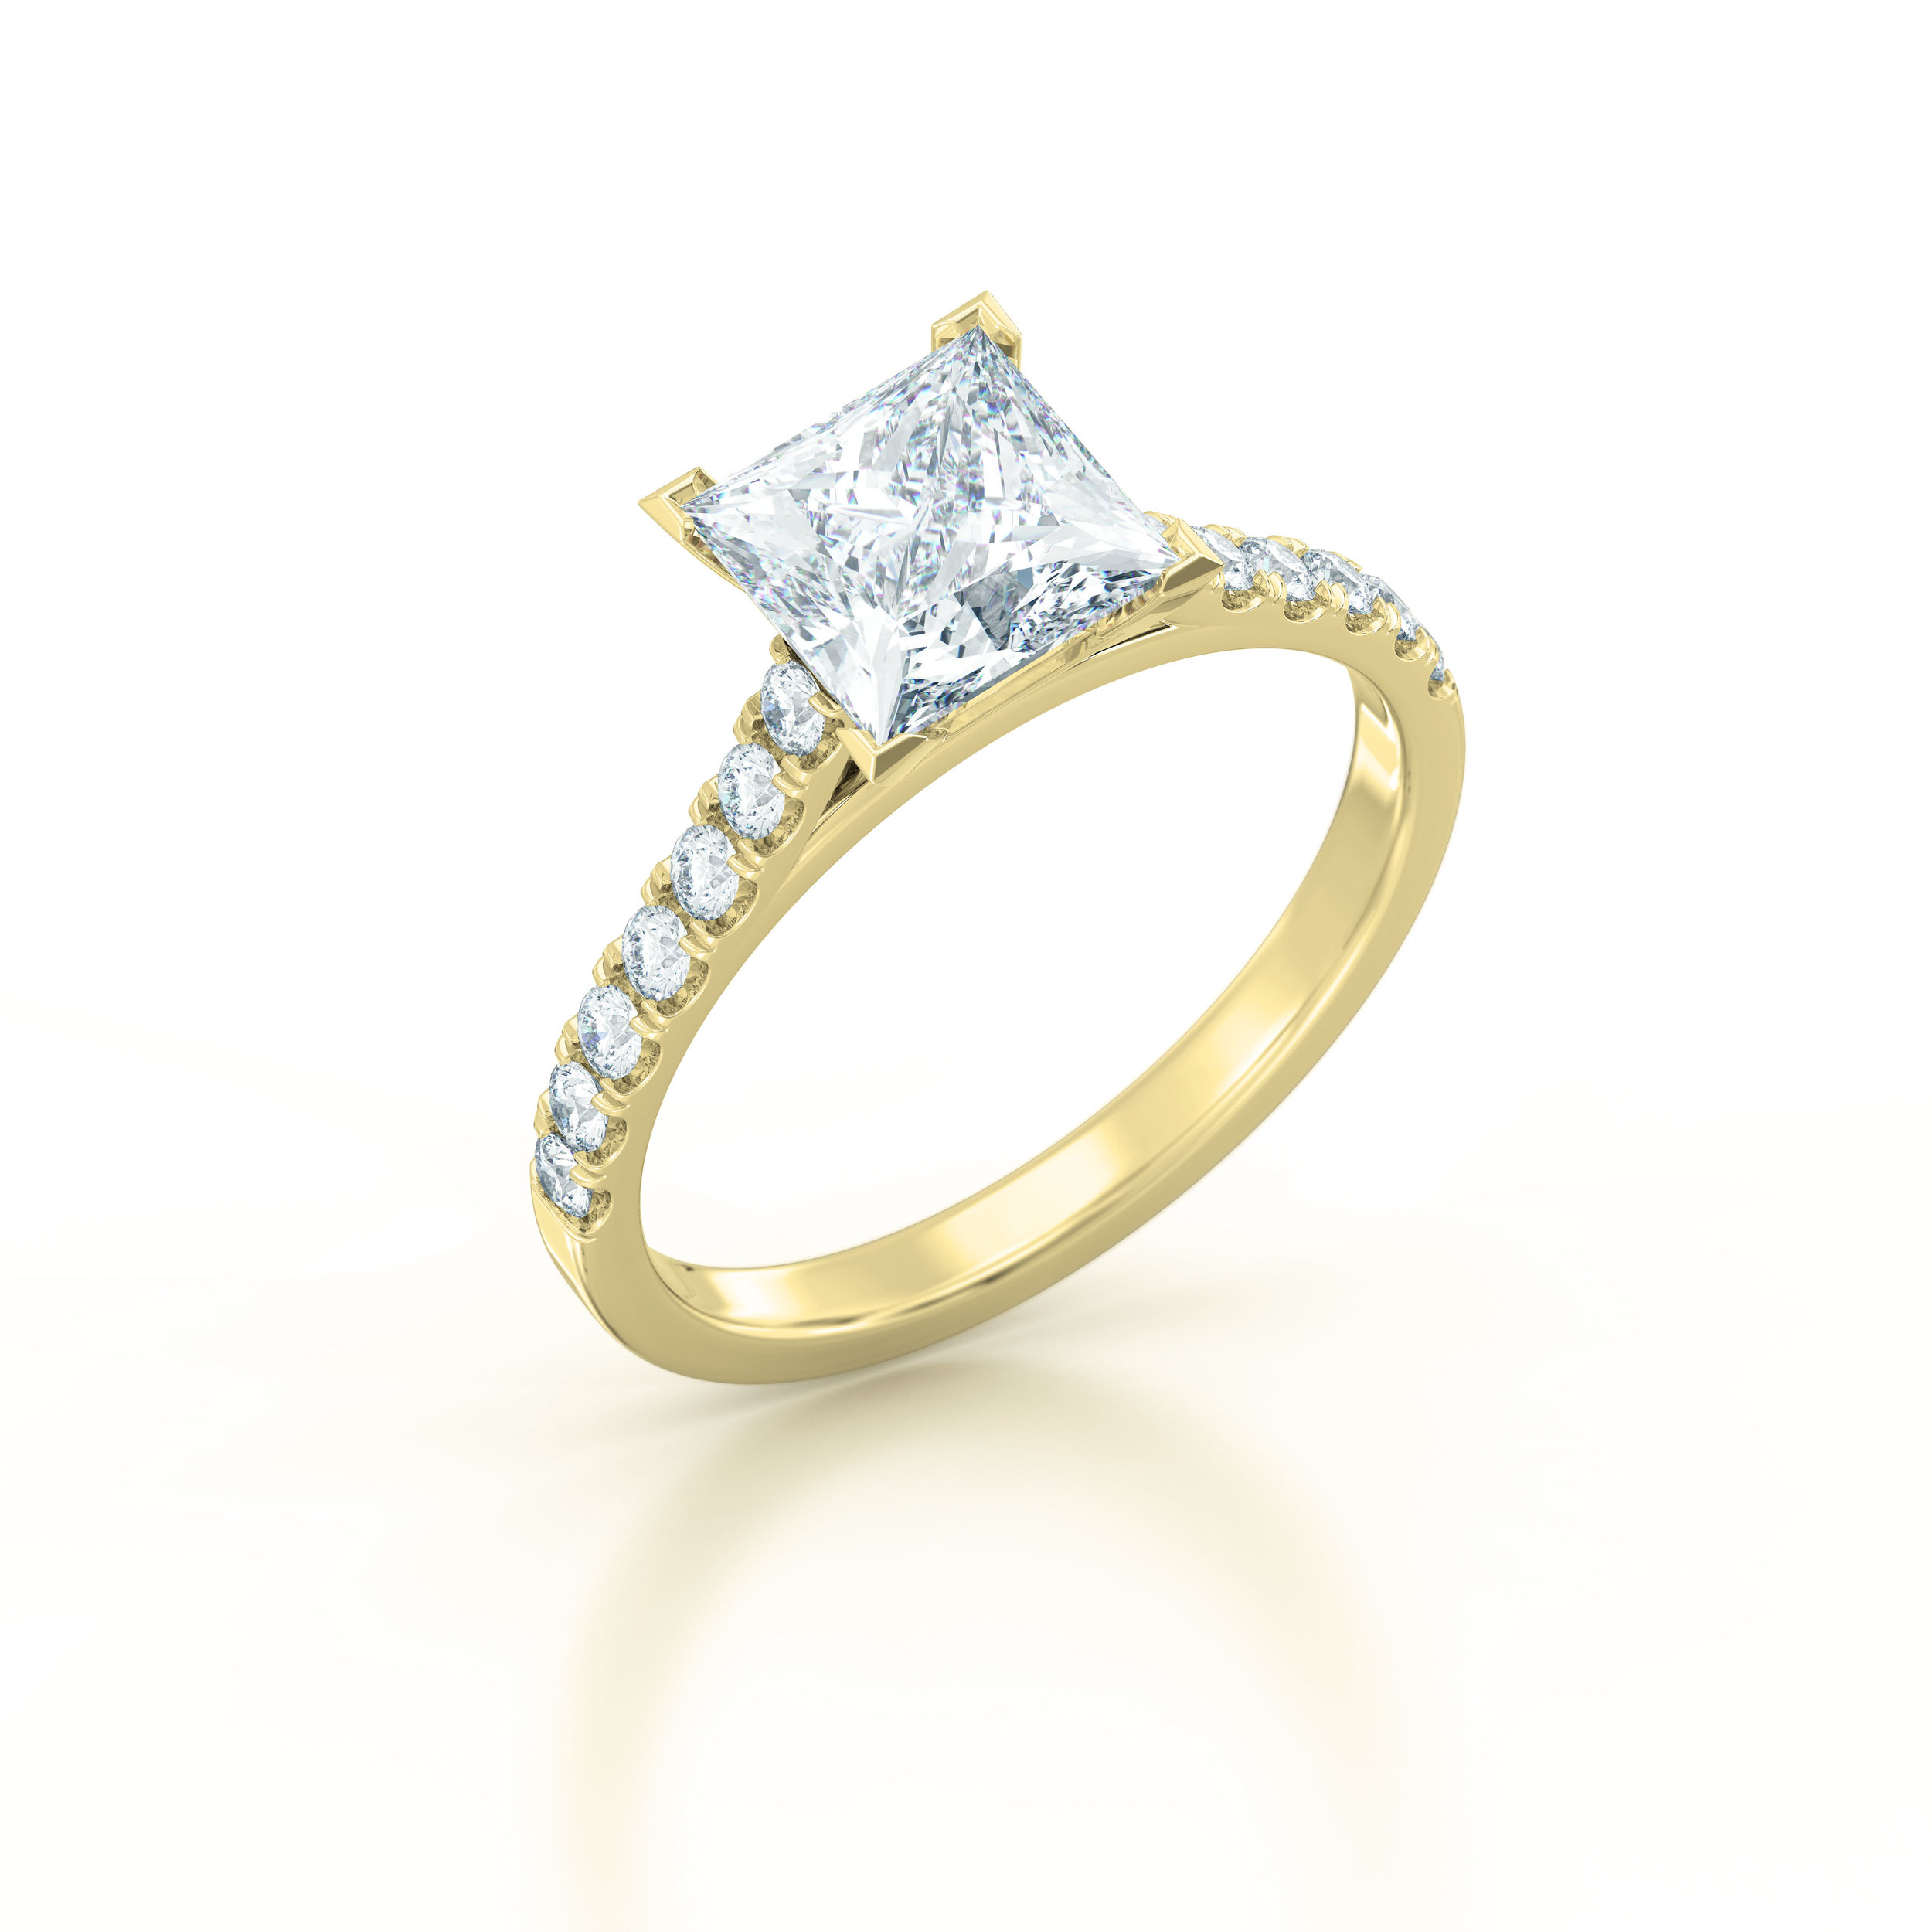 Princess cut diamond shoulder engagement ring